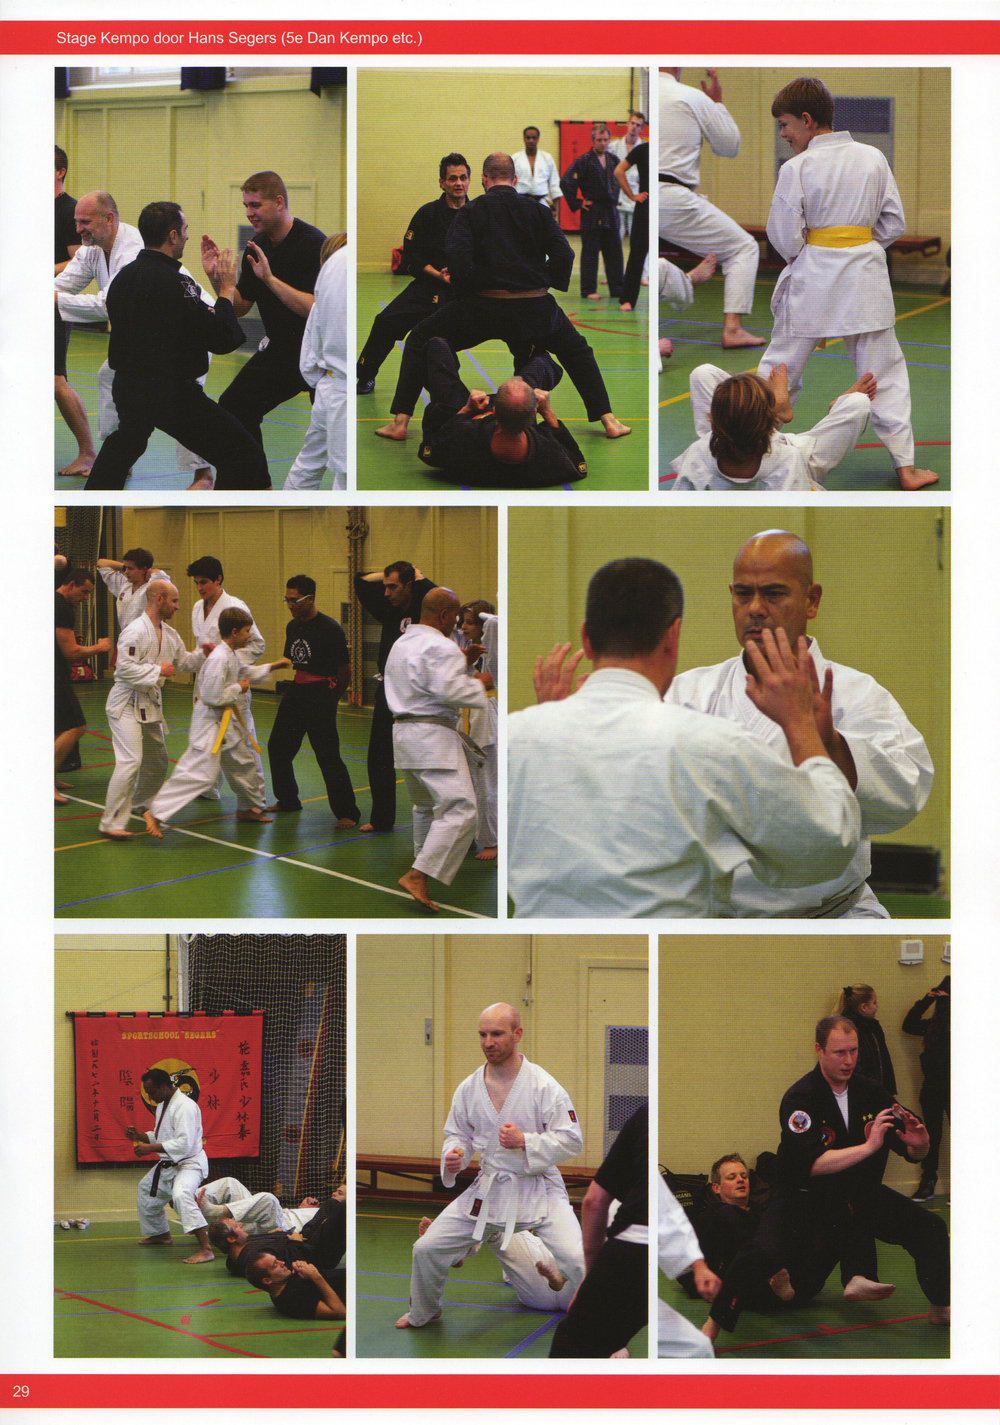 2012-11-04 NFK 7 Masters Martial Arts Festival Fotomagazine 2012 Pagina 29.jpg